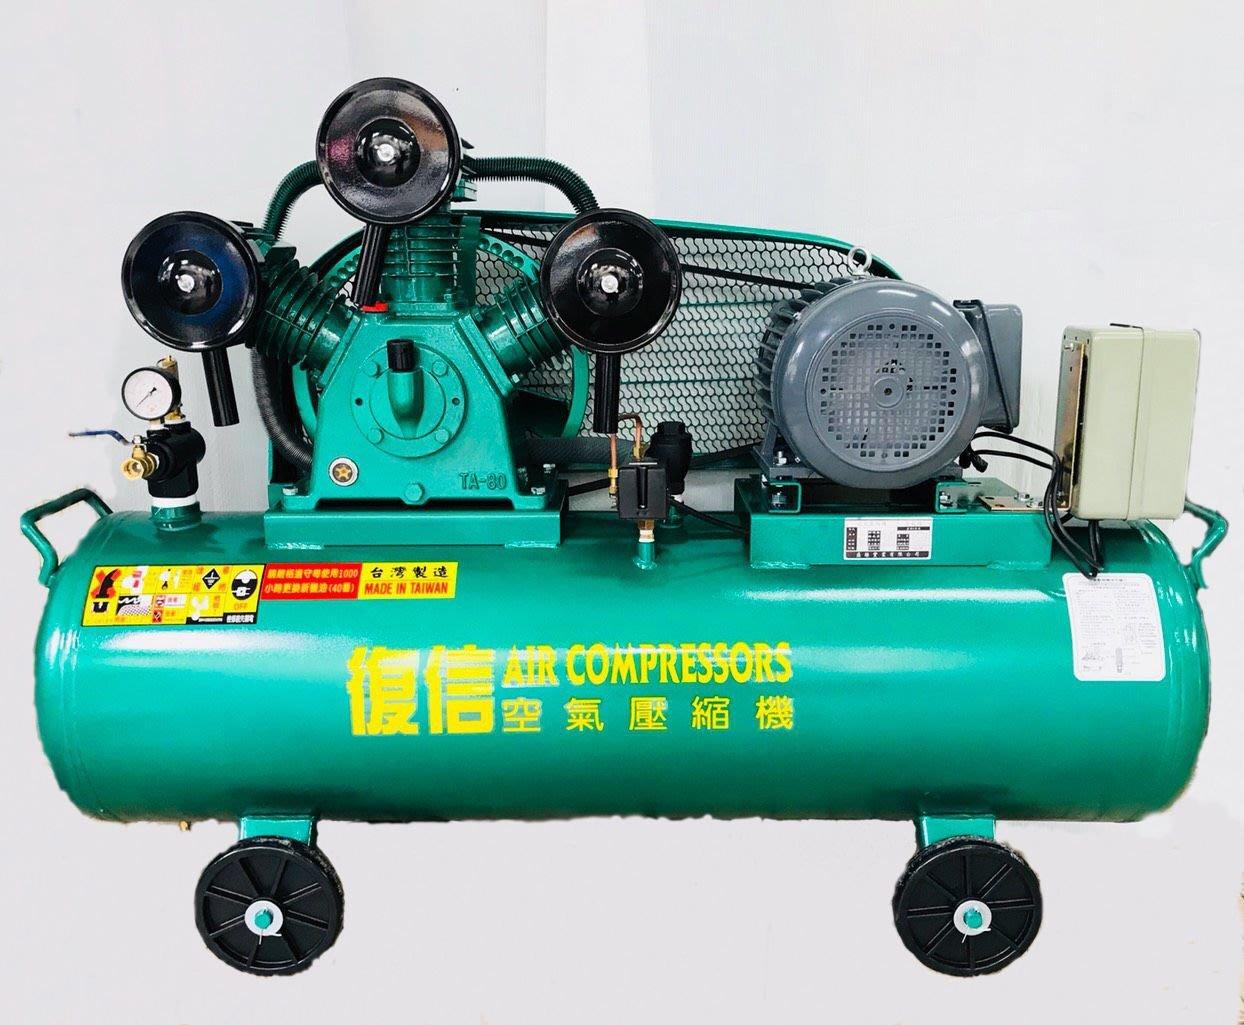 D 二姐五金 F 復信 台灣製造 5HP 單相 220V 皮帶式 空壓機 空氣壓縮機 價錢3xxxx